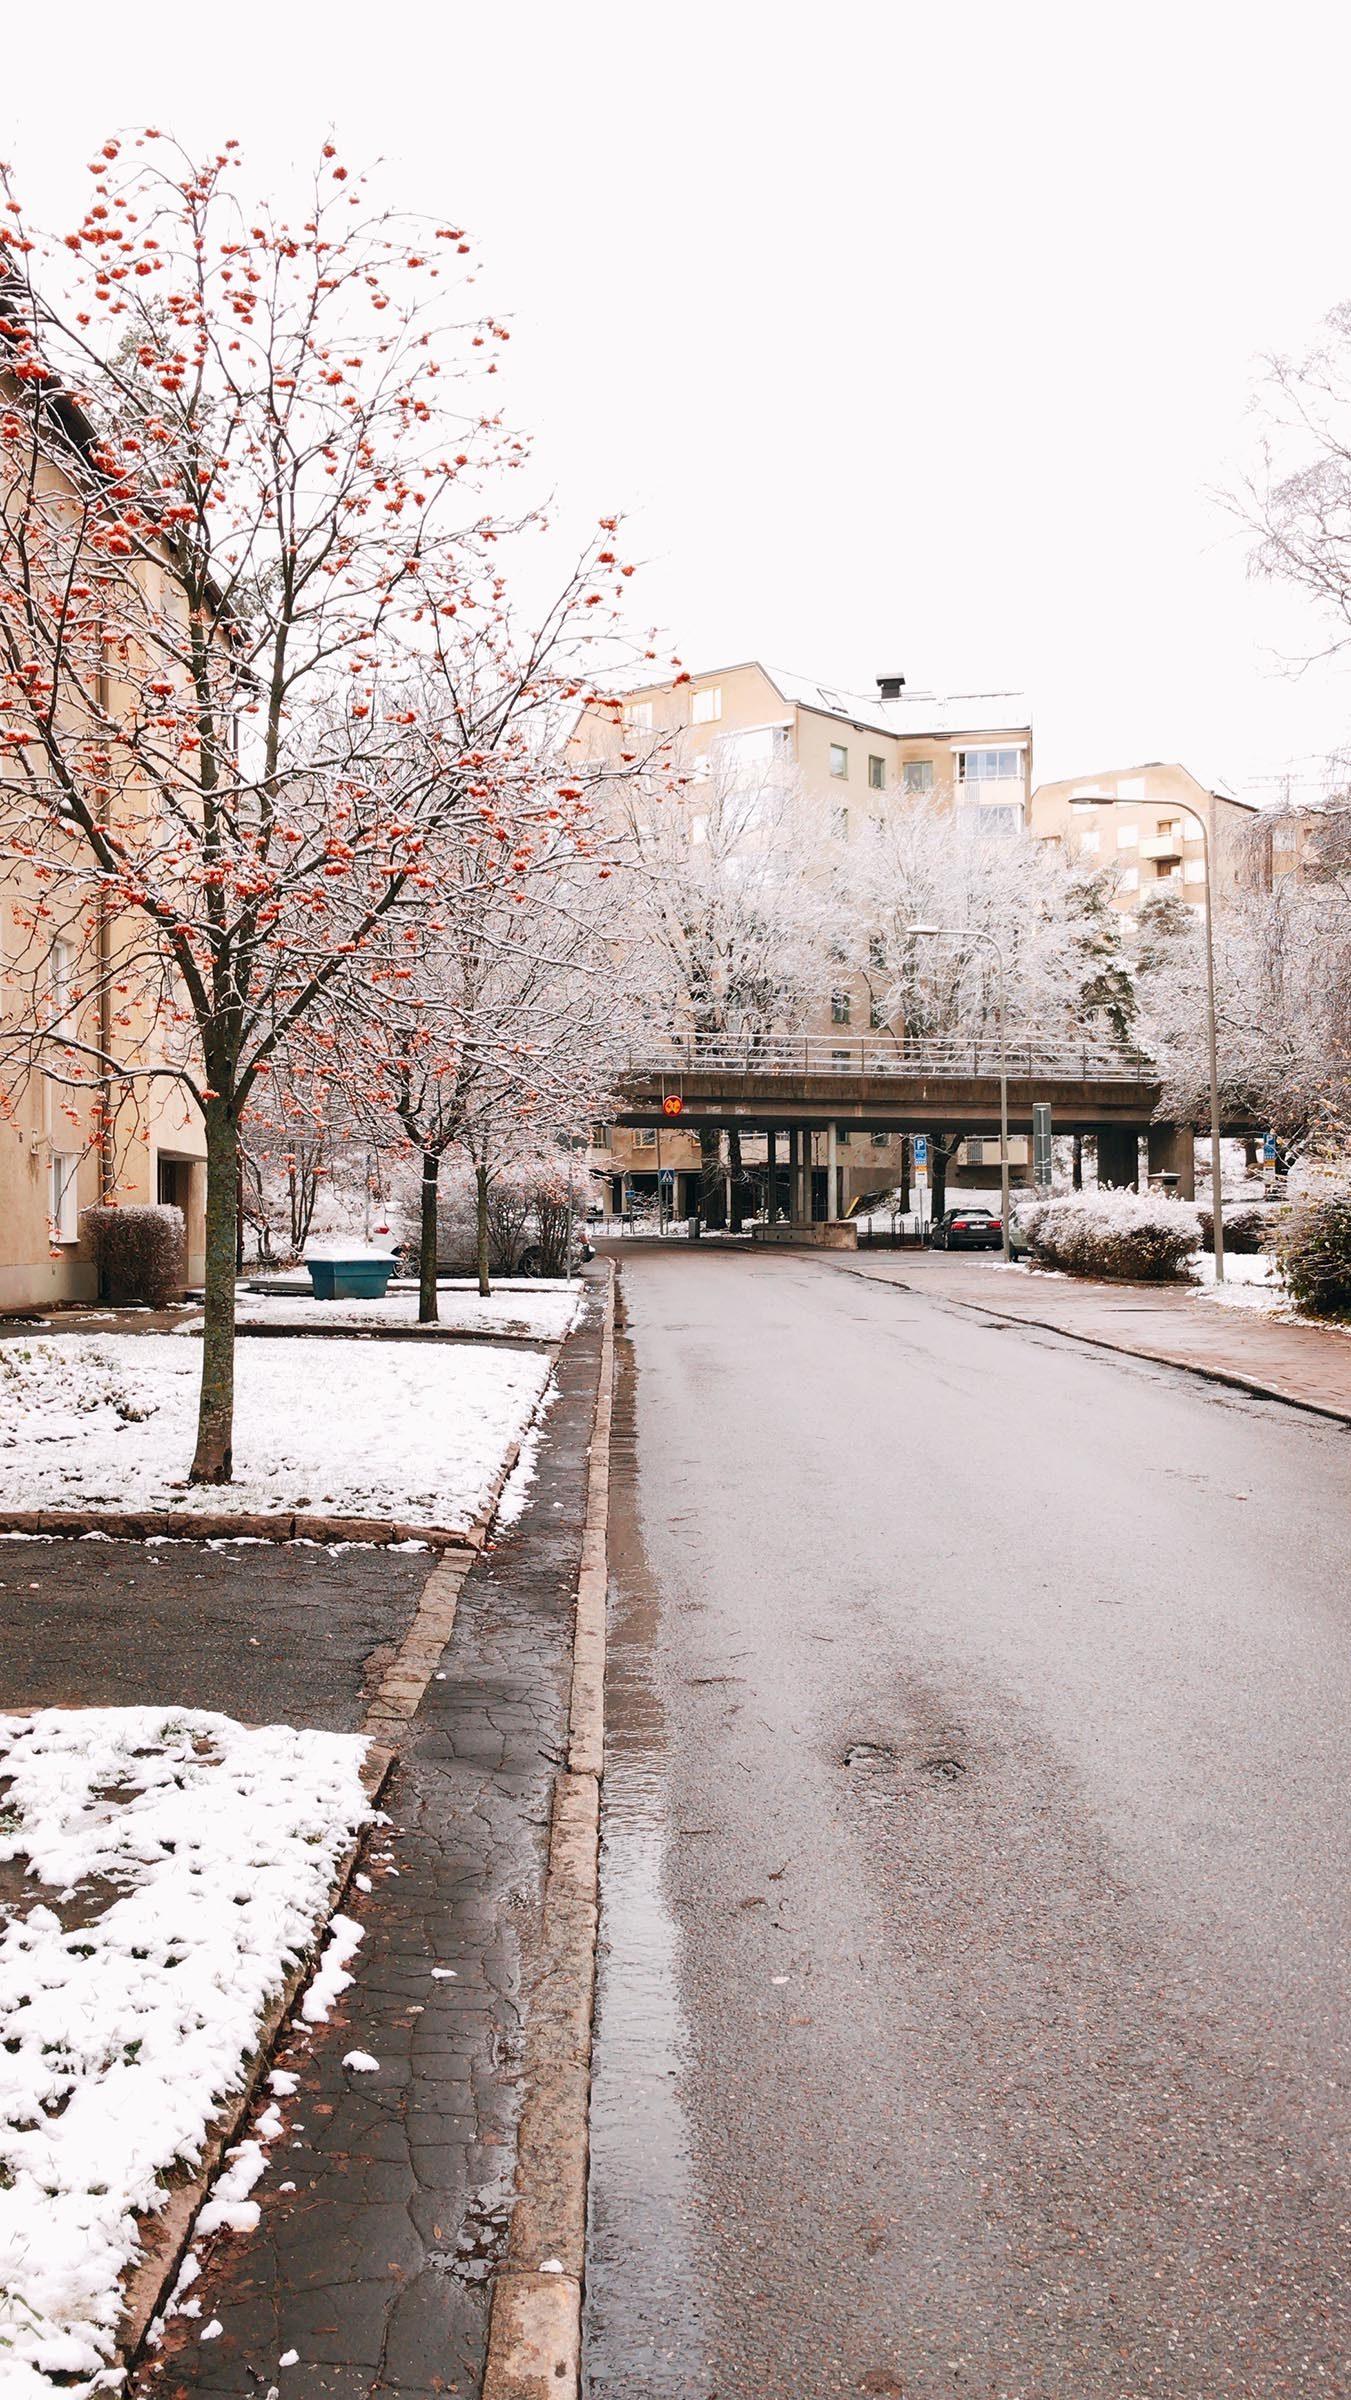 Sveriges smalaste trottoar